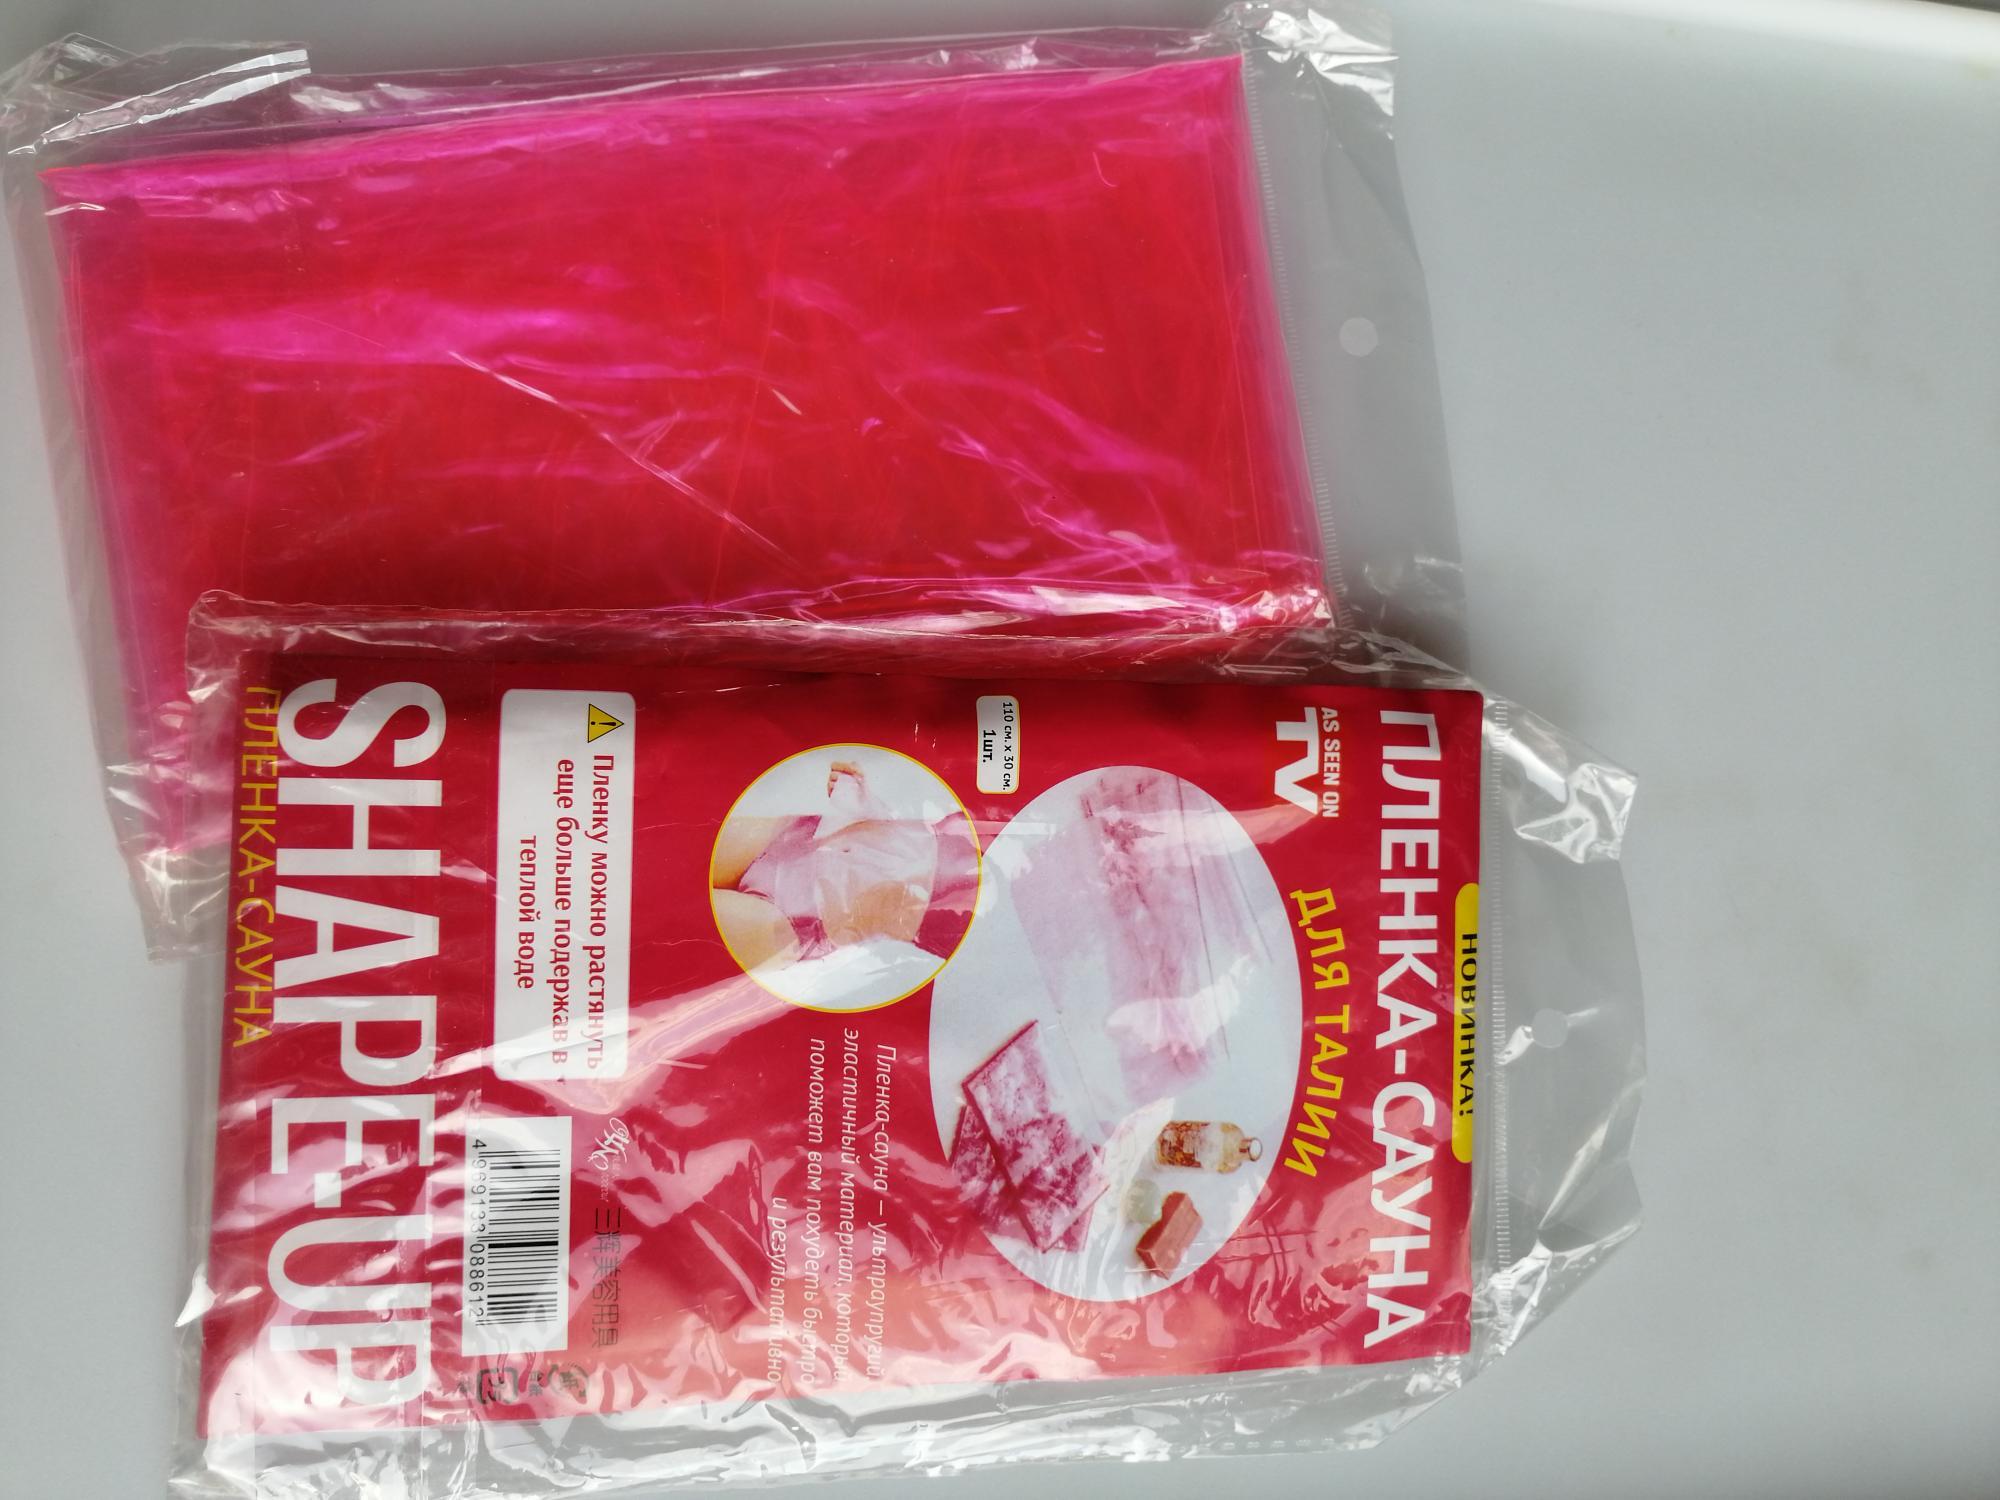 Пленка-сауна для талии в Зеленограде 89167081352 купить 3